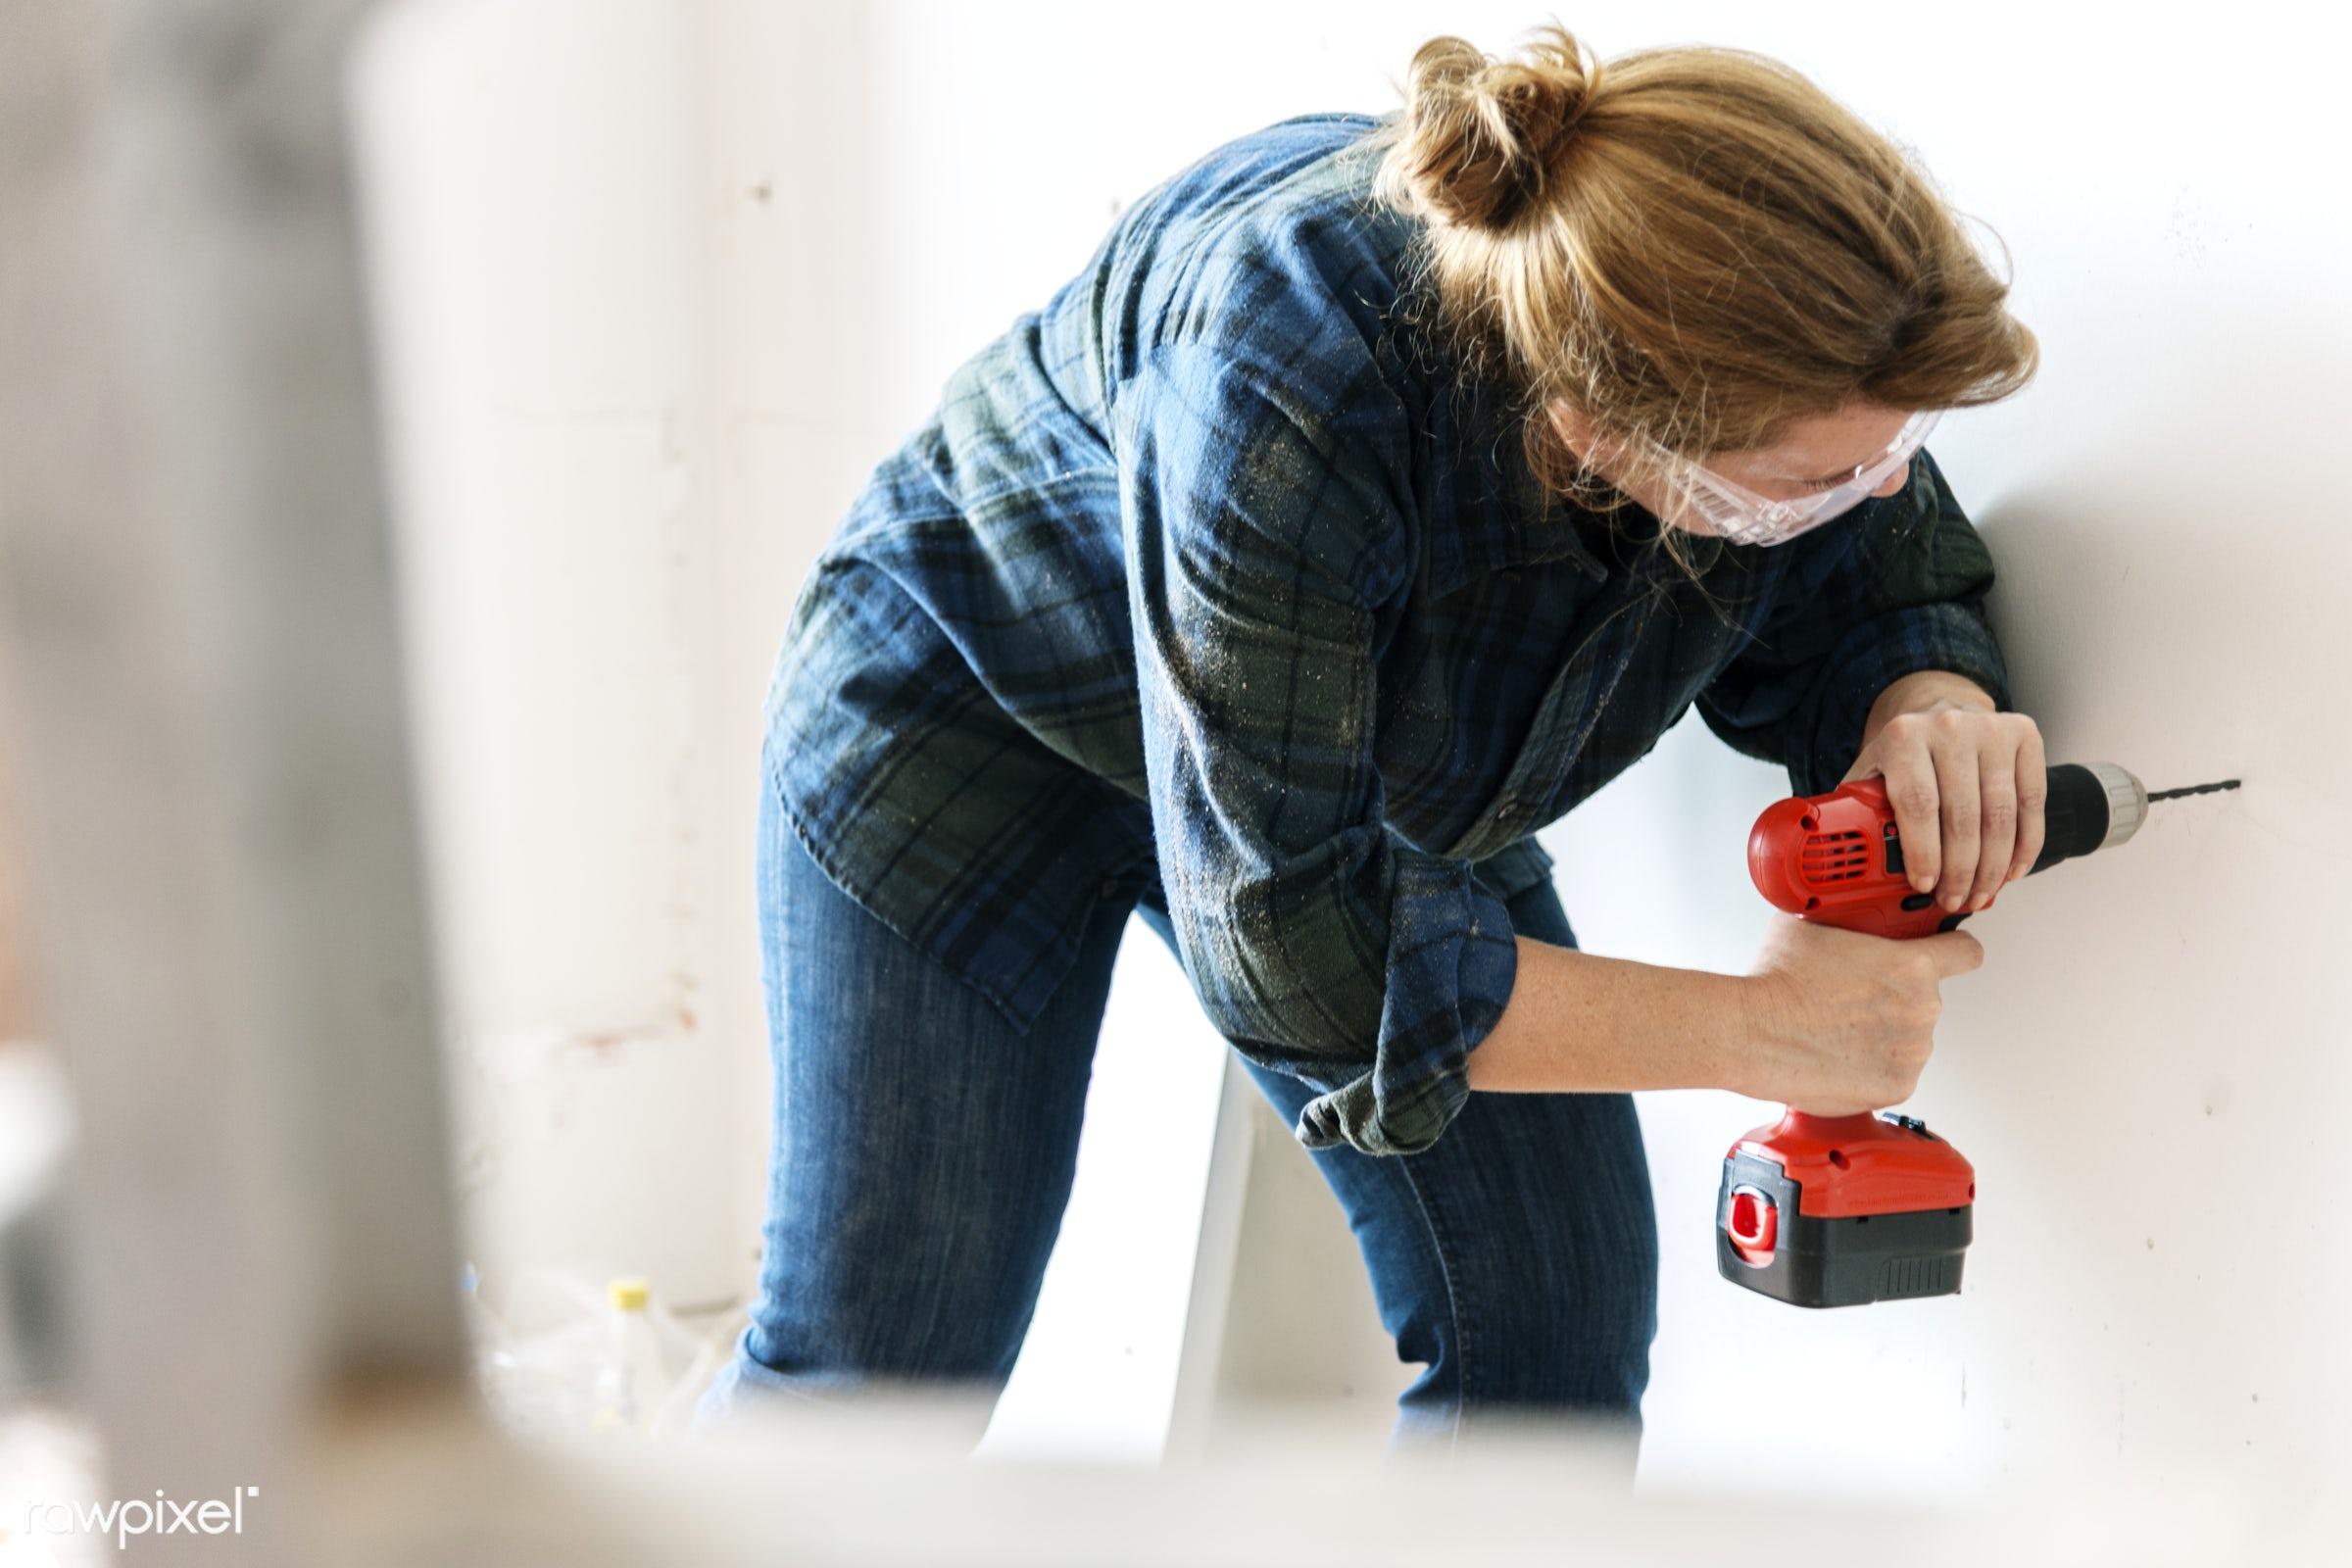 american, british, builder, carpenter, construction, contractor, development, drill, drilling, engineering, equipment,...